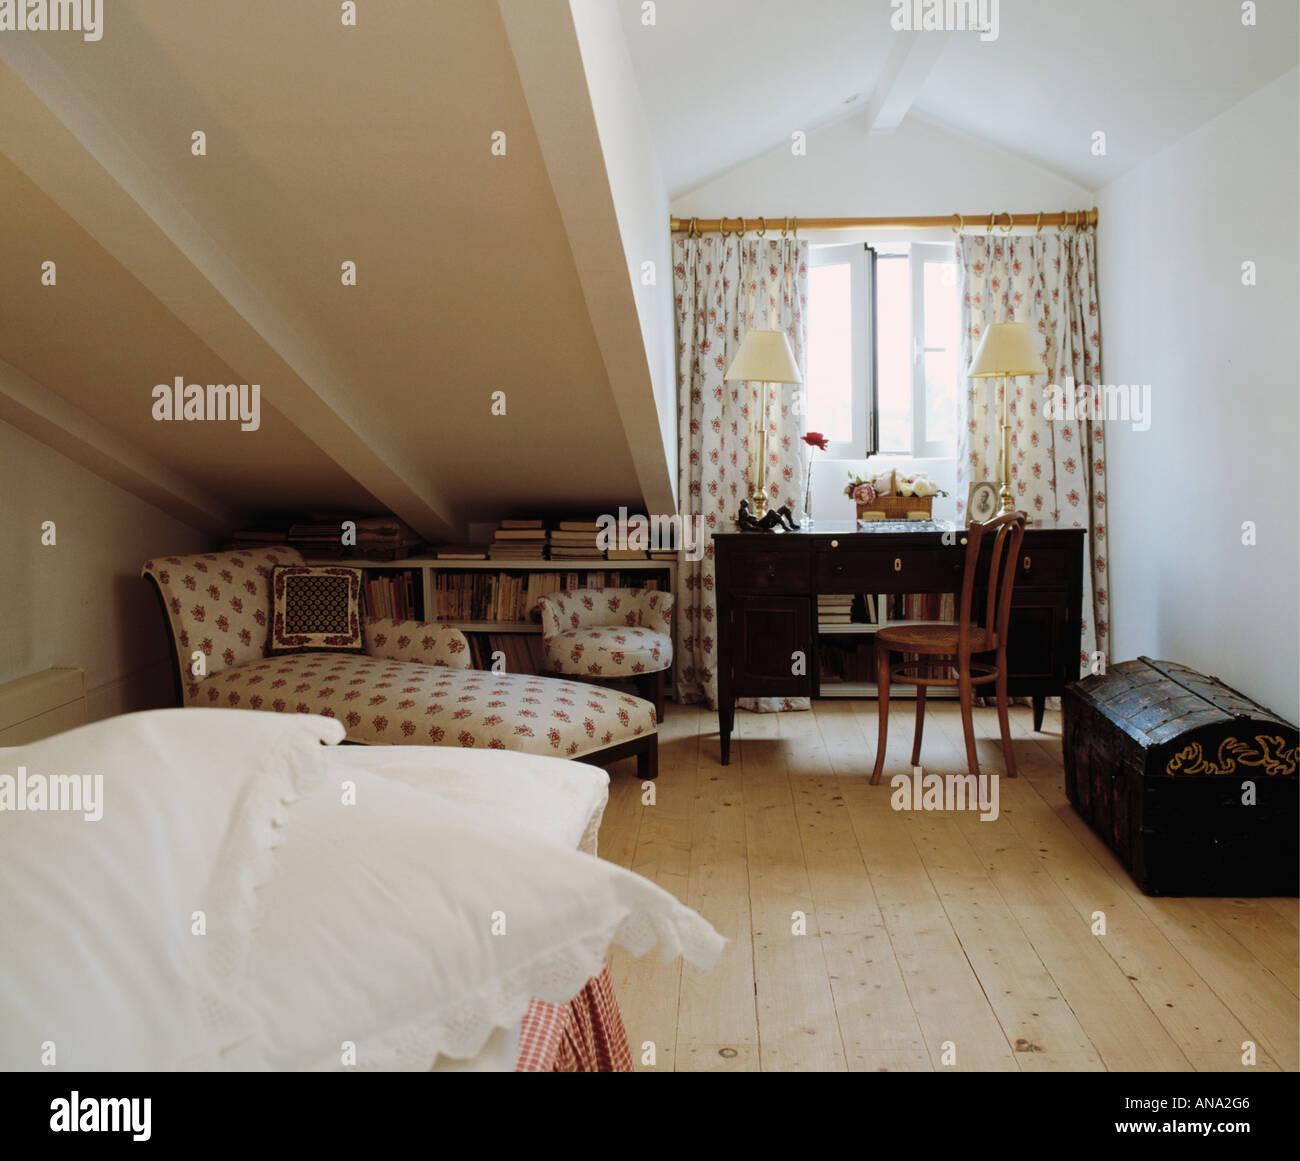 attics bedrooms stockfotos attics bedrooms bilder alamy. Black Bedroom Furniture Sets. Home Design Ideas